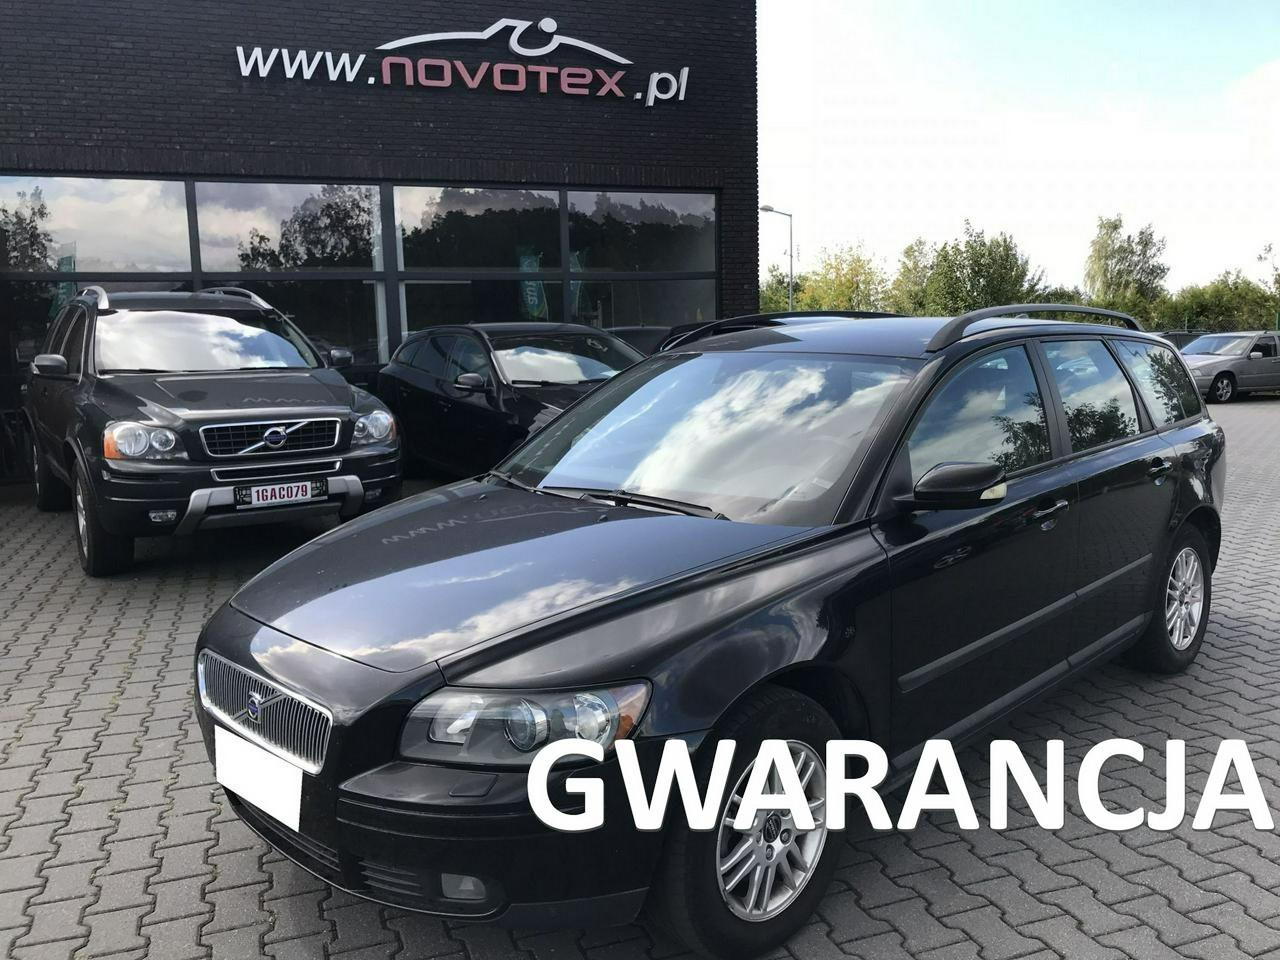 Volvo V50 1.6D*Momentum*168Tkm*xenon*alu*serwis w ASO*gwarancja VIP Service